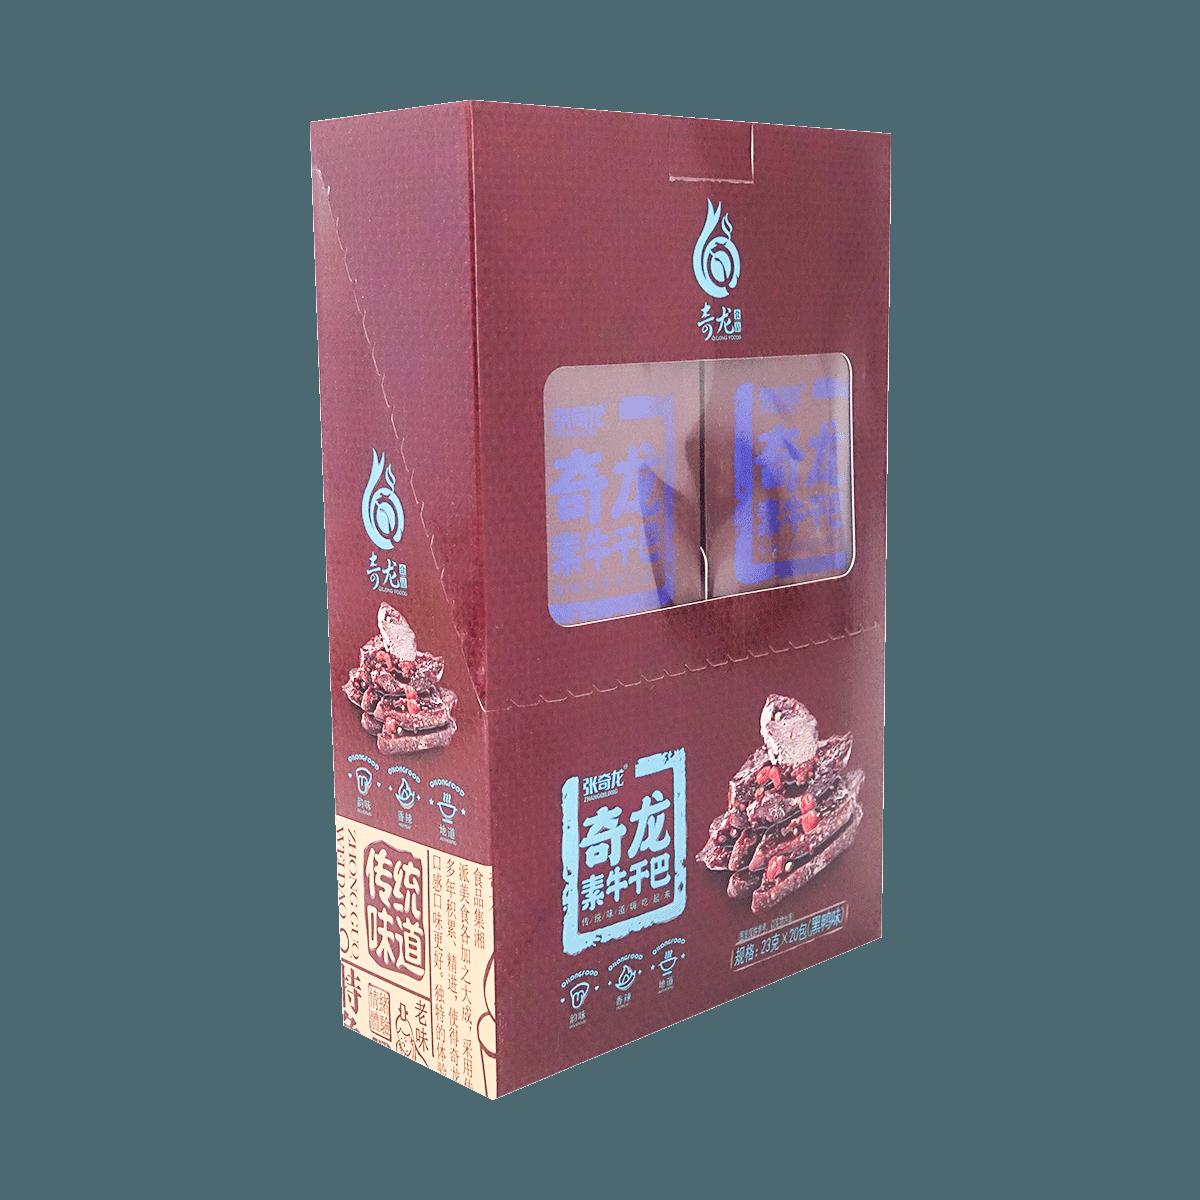 Yamibuy.com:Customer reviews:ZHANGQILONG Tofu Strips Braised Duck Flavor 460g